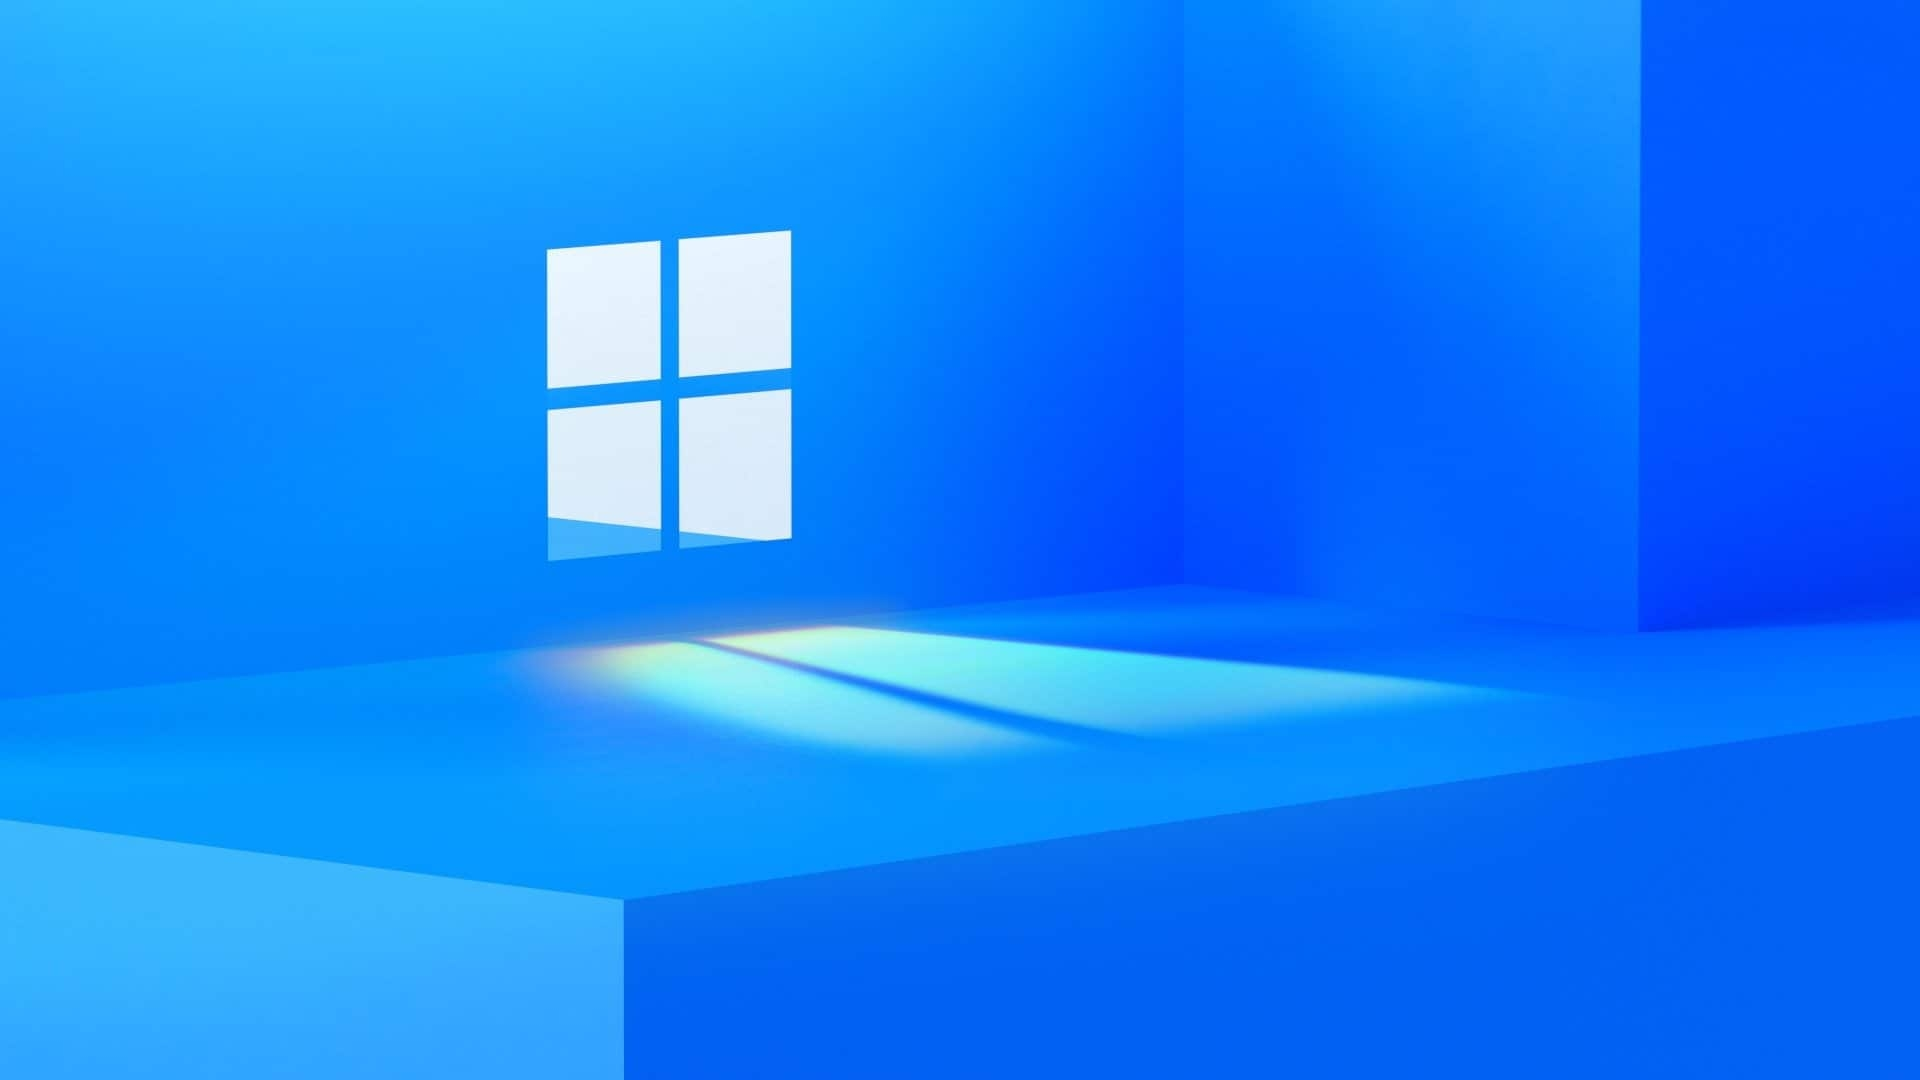 Windows 11 fundo